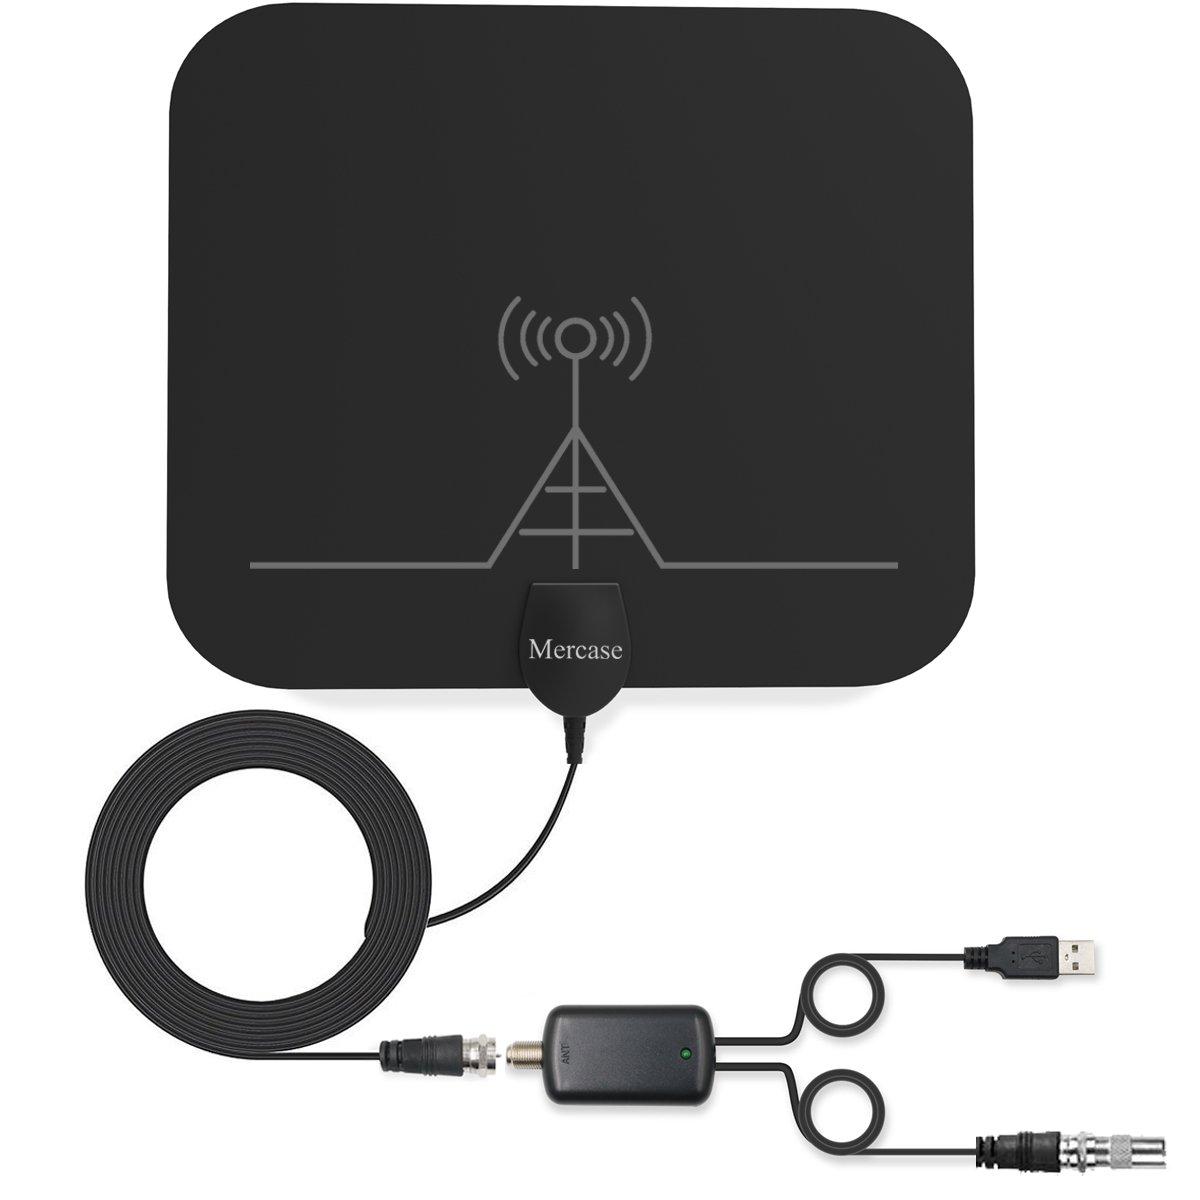 Antena de TV, Mercase Antena Interior HDTV Digital [Rango de 60 Millas/95 KM con Amplificador de Señal Avanzado, Cable Coaxial de 13,5 Pies] Poderosa Antena (Negro): Amazon.es: Electrónica